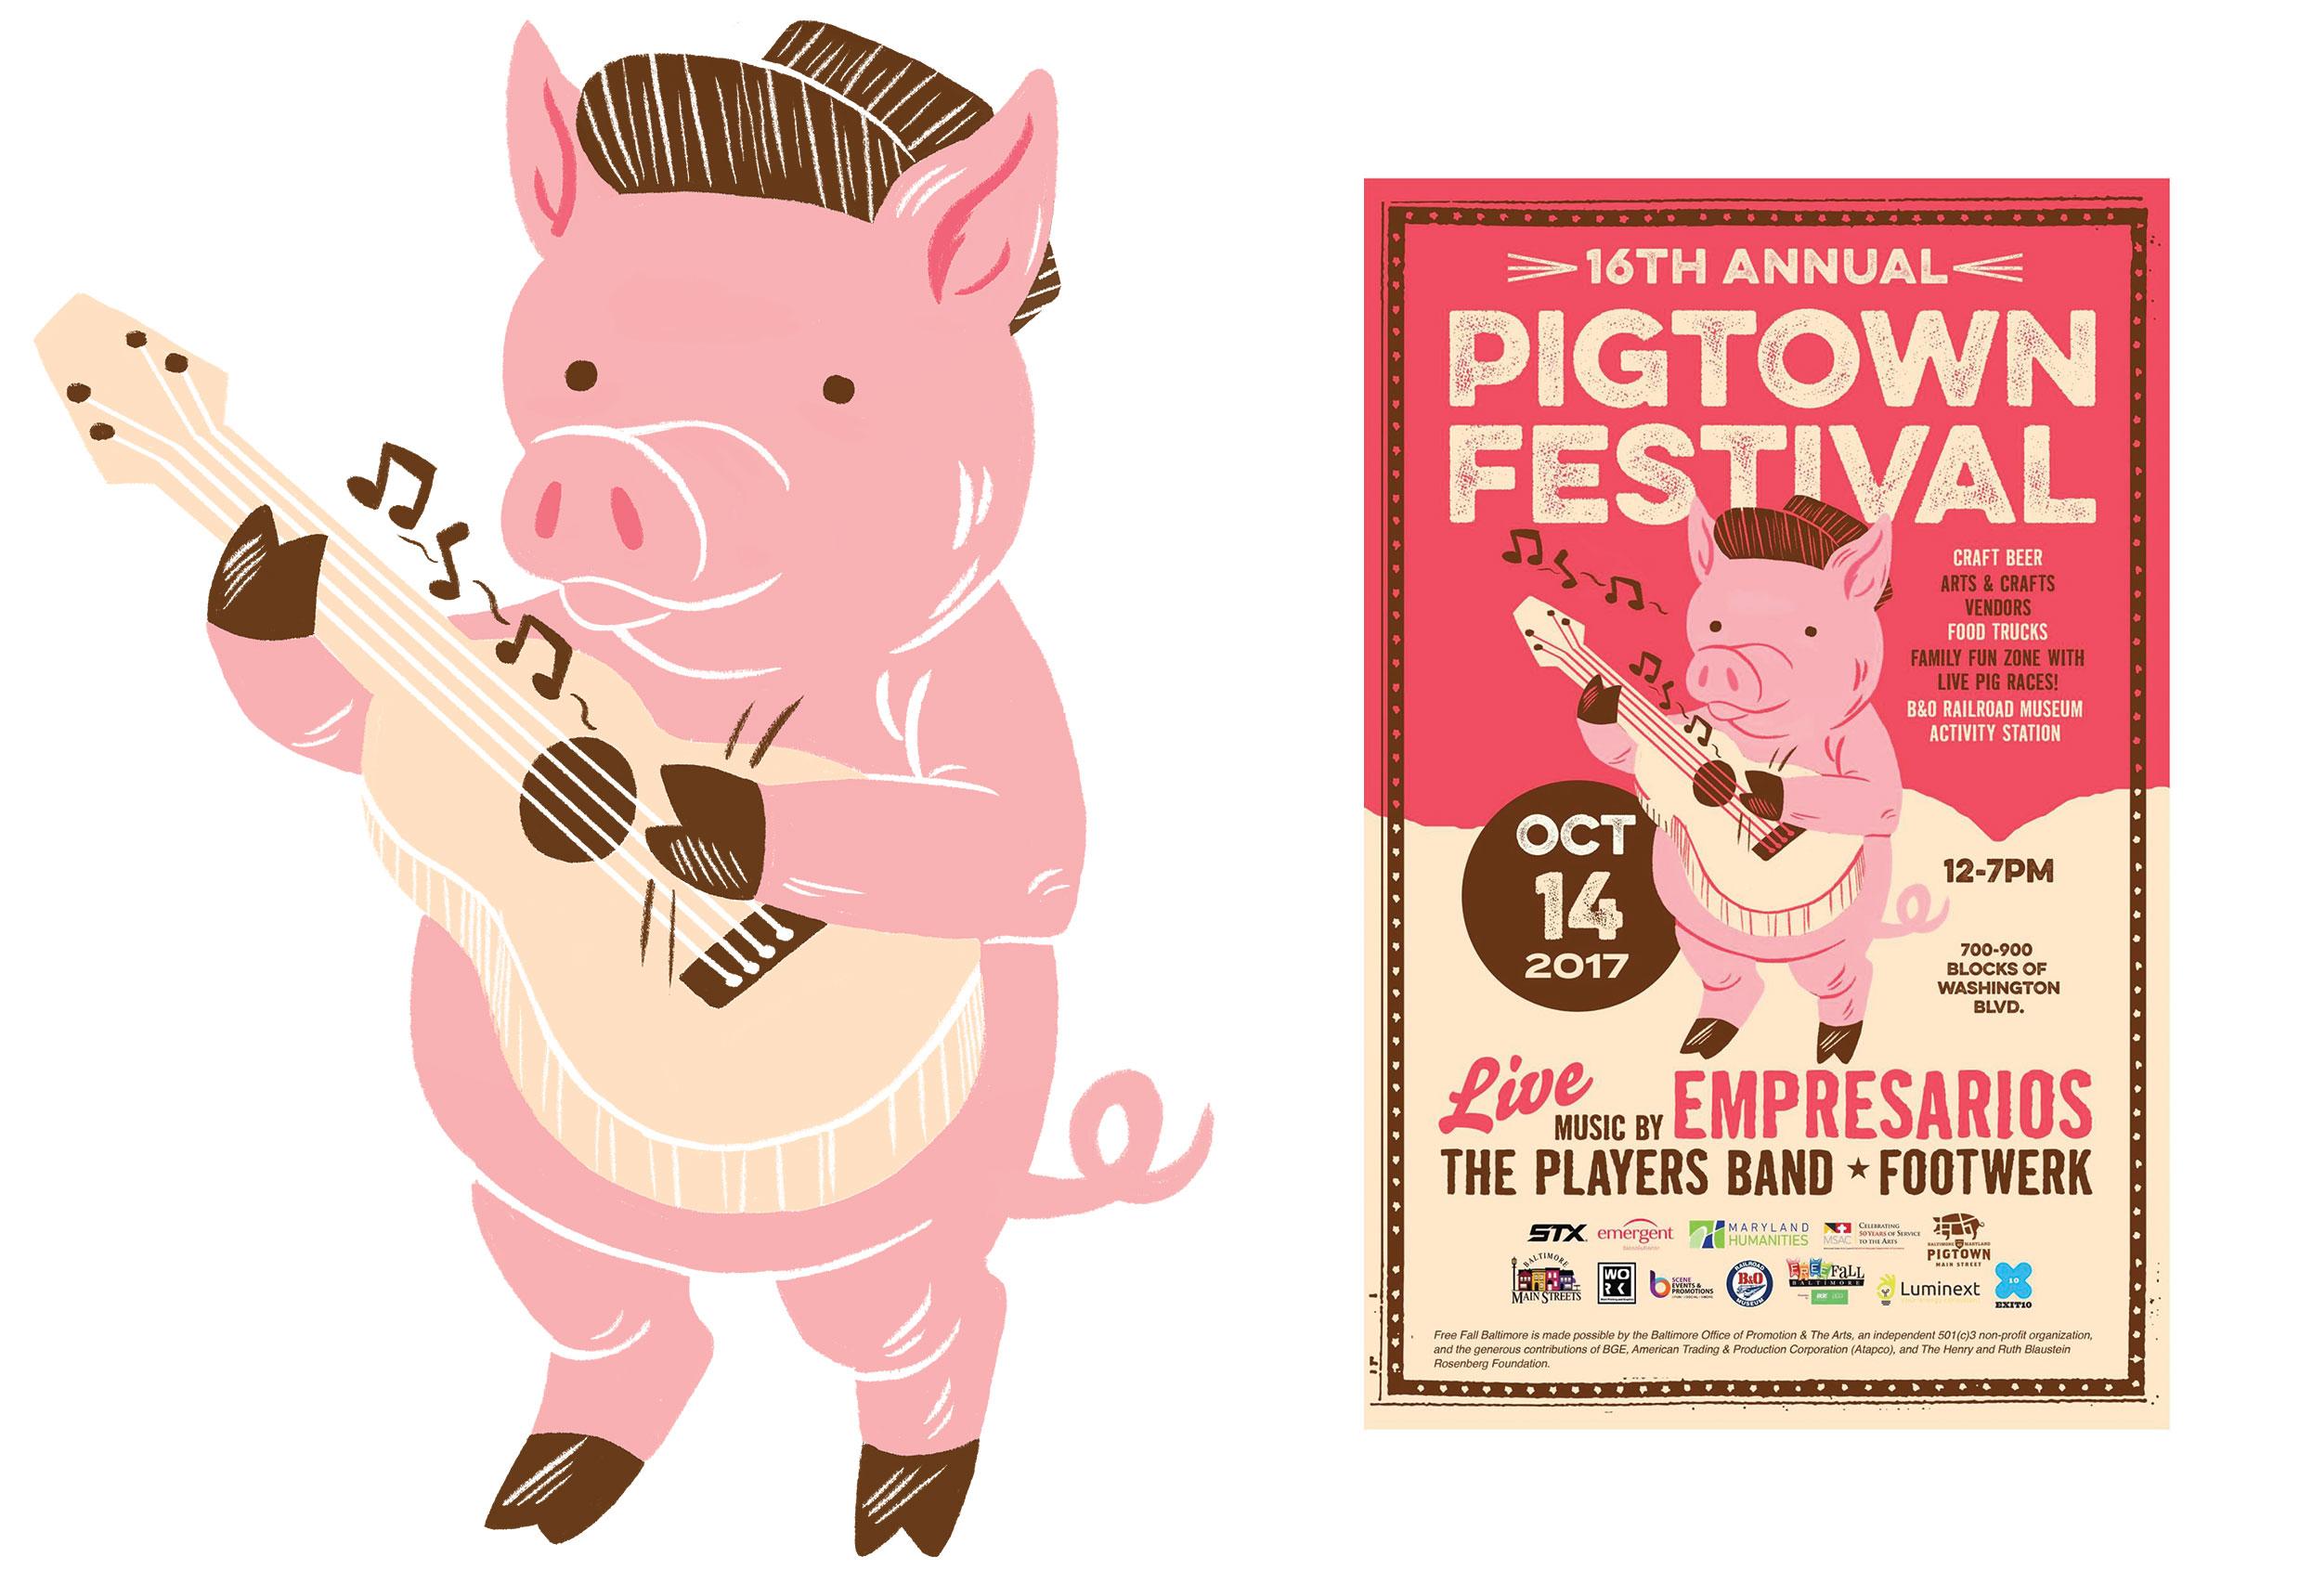 Pigtown Festival Pig